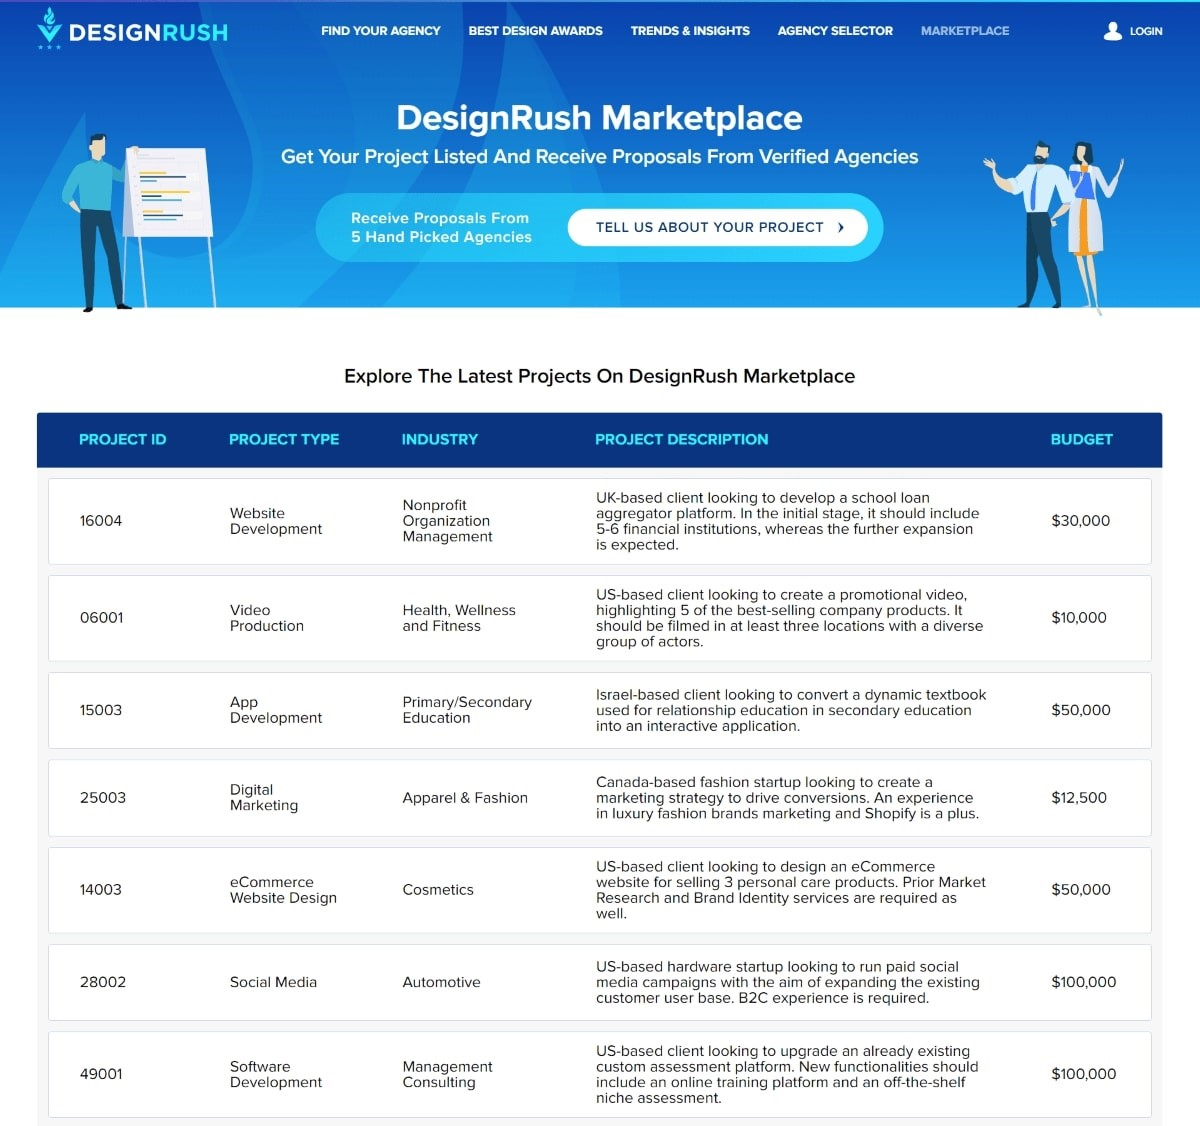 DesignRush Marketplace